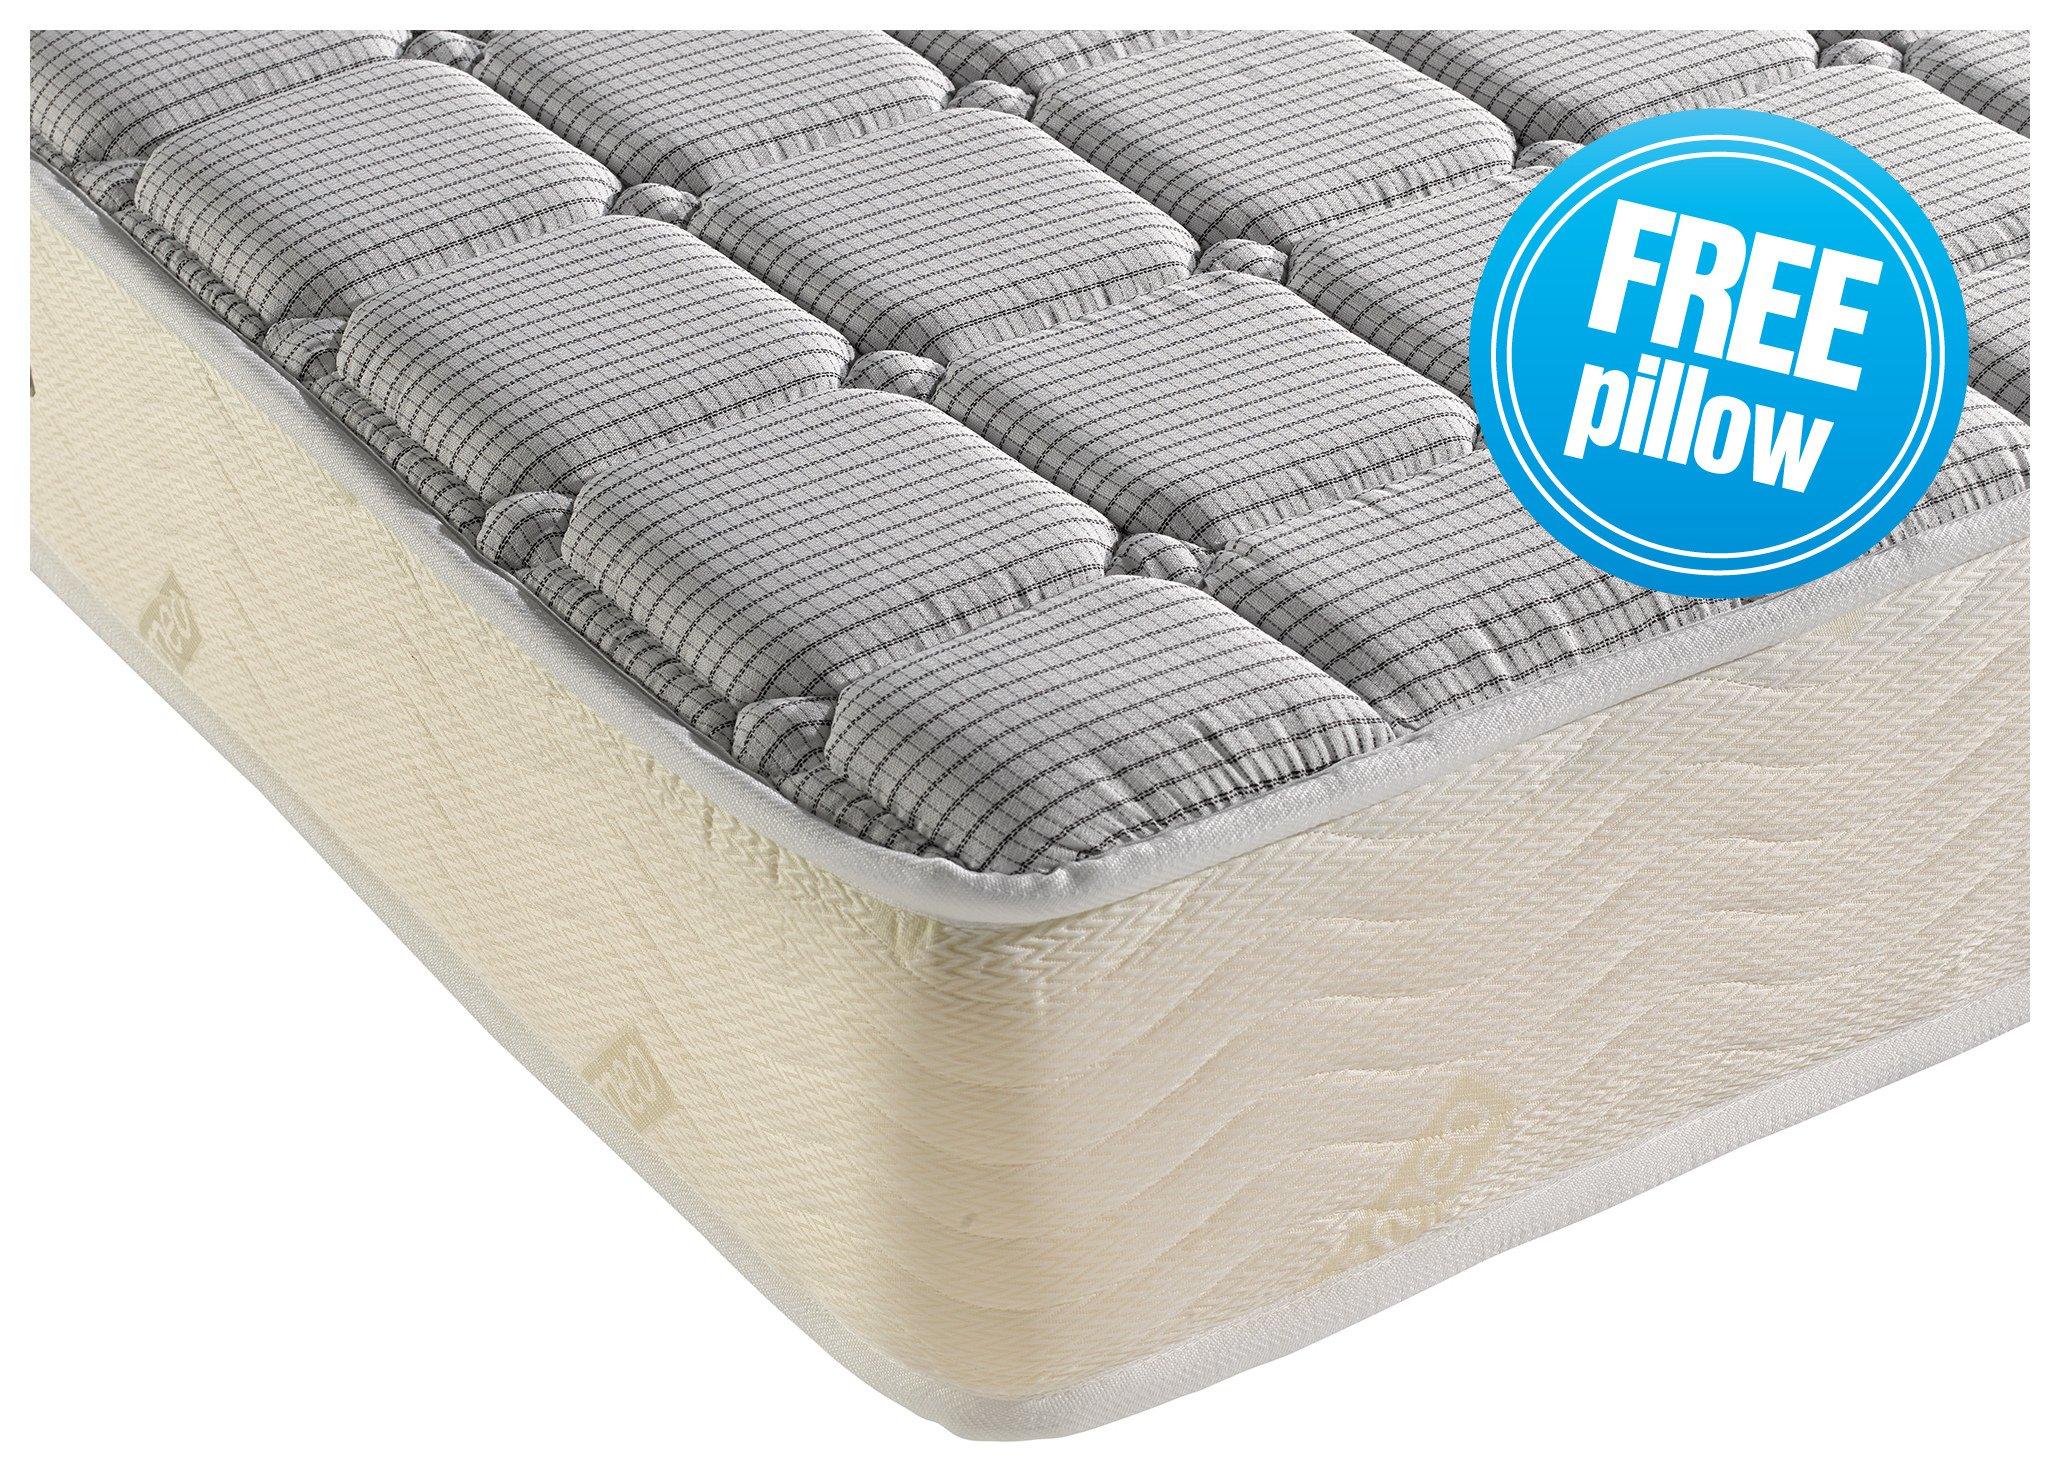 Image of Dormeo Deluxe Memory Foam Kingsize Mattress